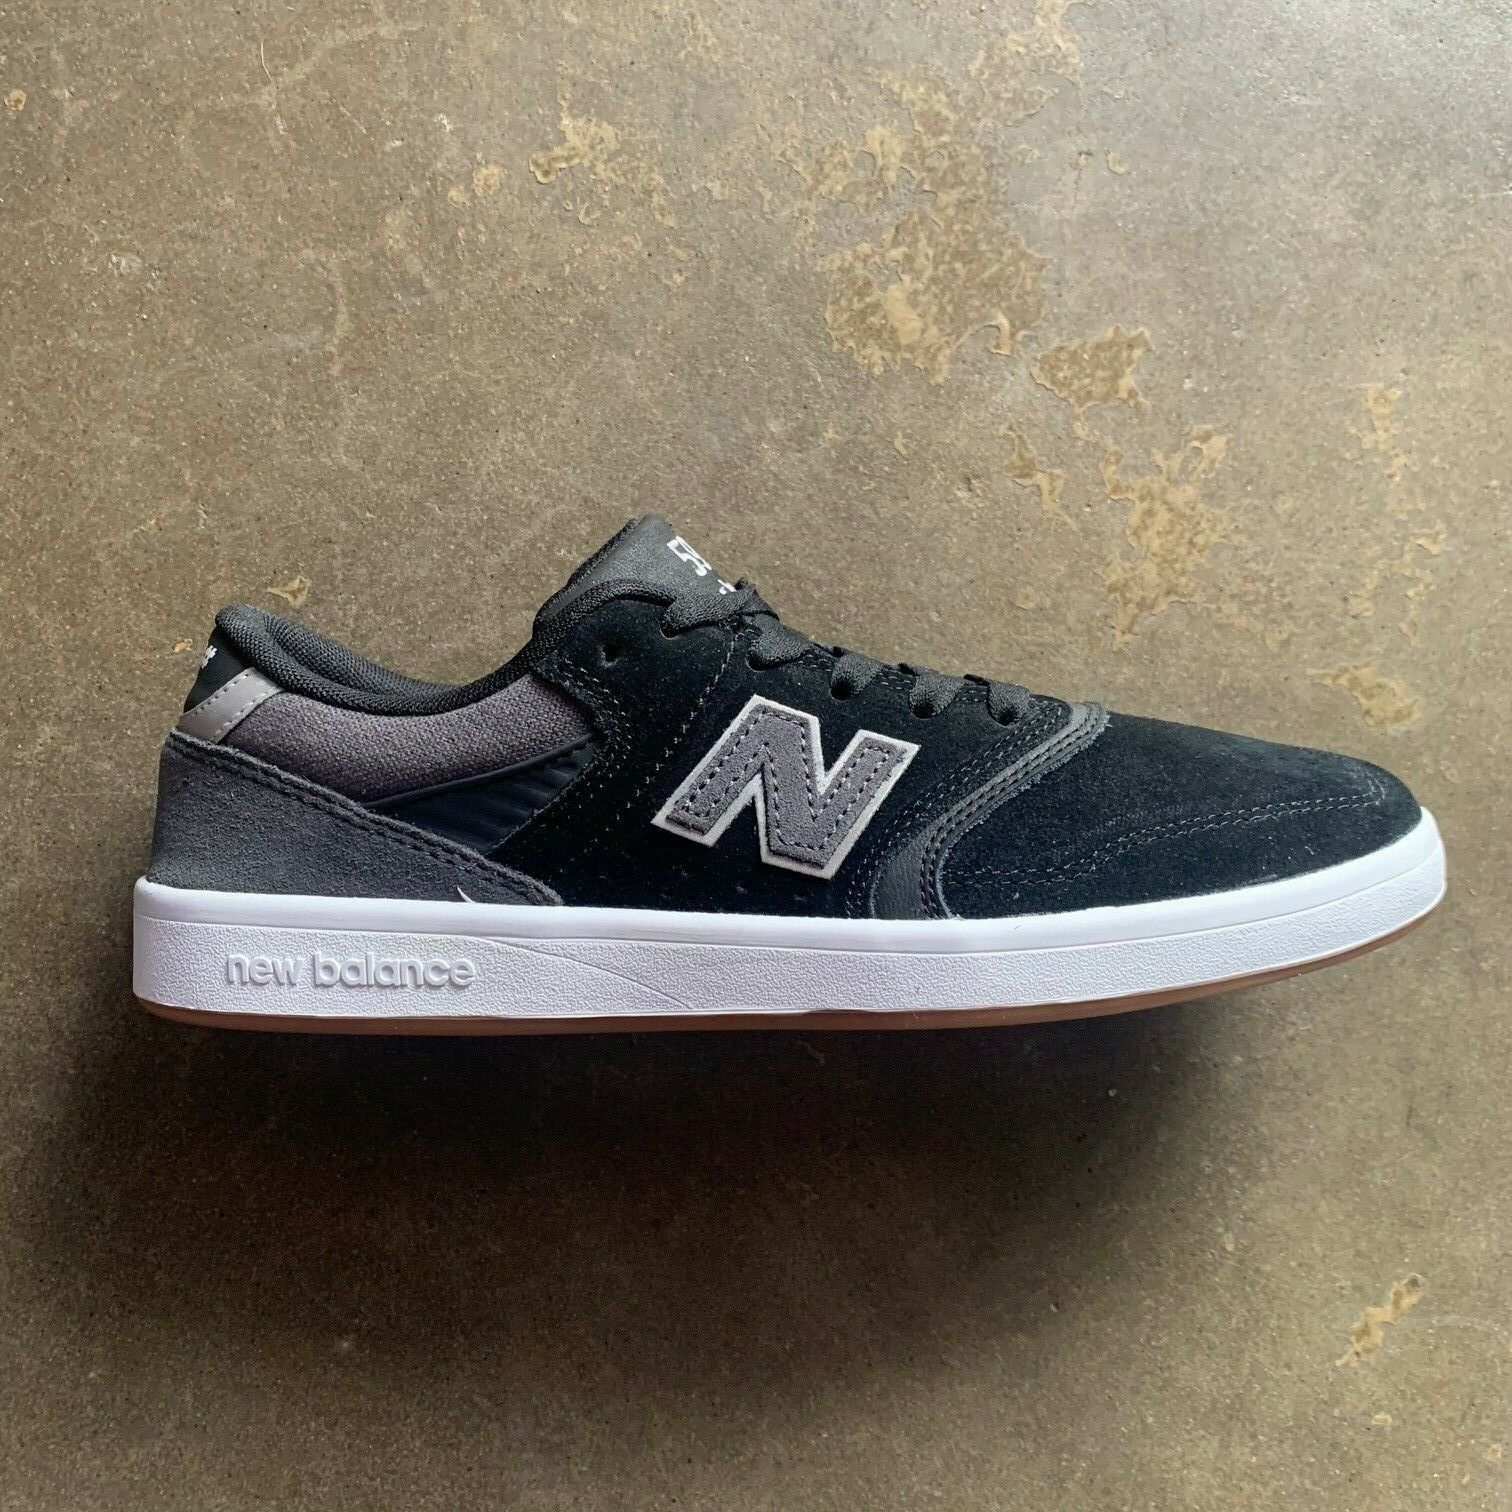 NEW BALANCE NUMERIC 598 BLACK WHITE GUM SIZE 8-11 --FAST SHIPPING--